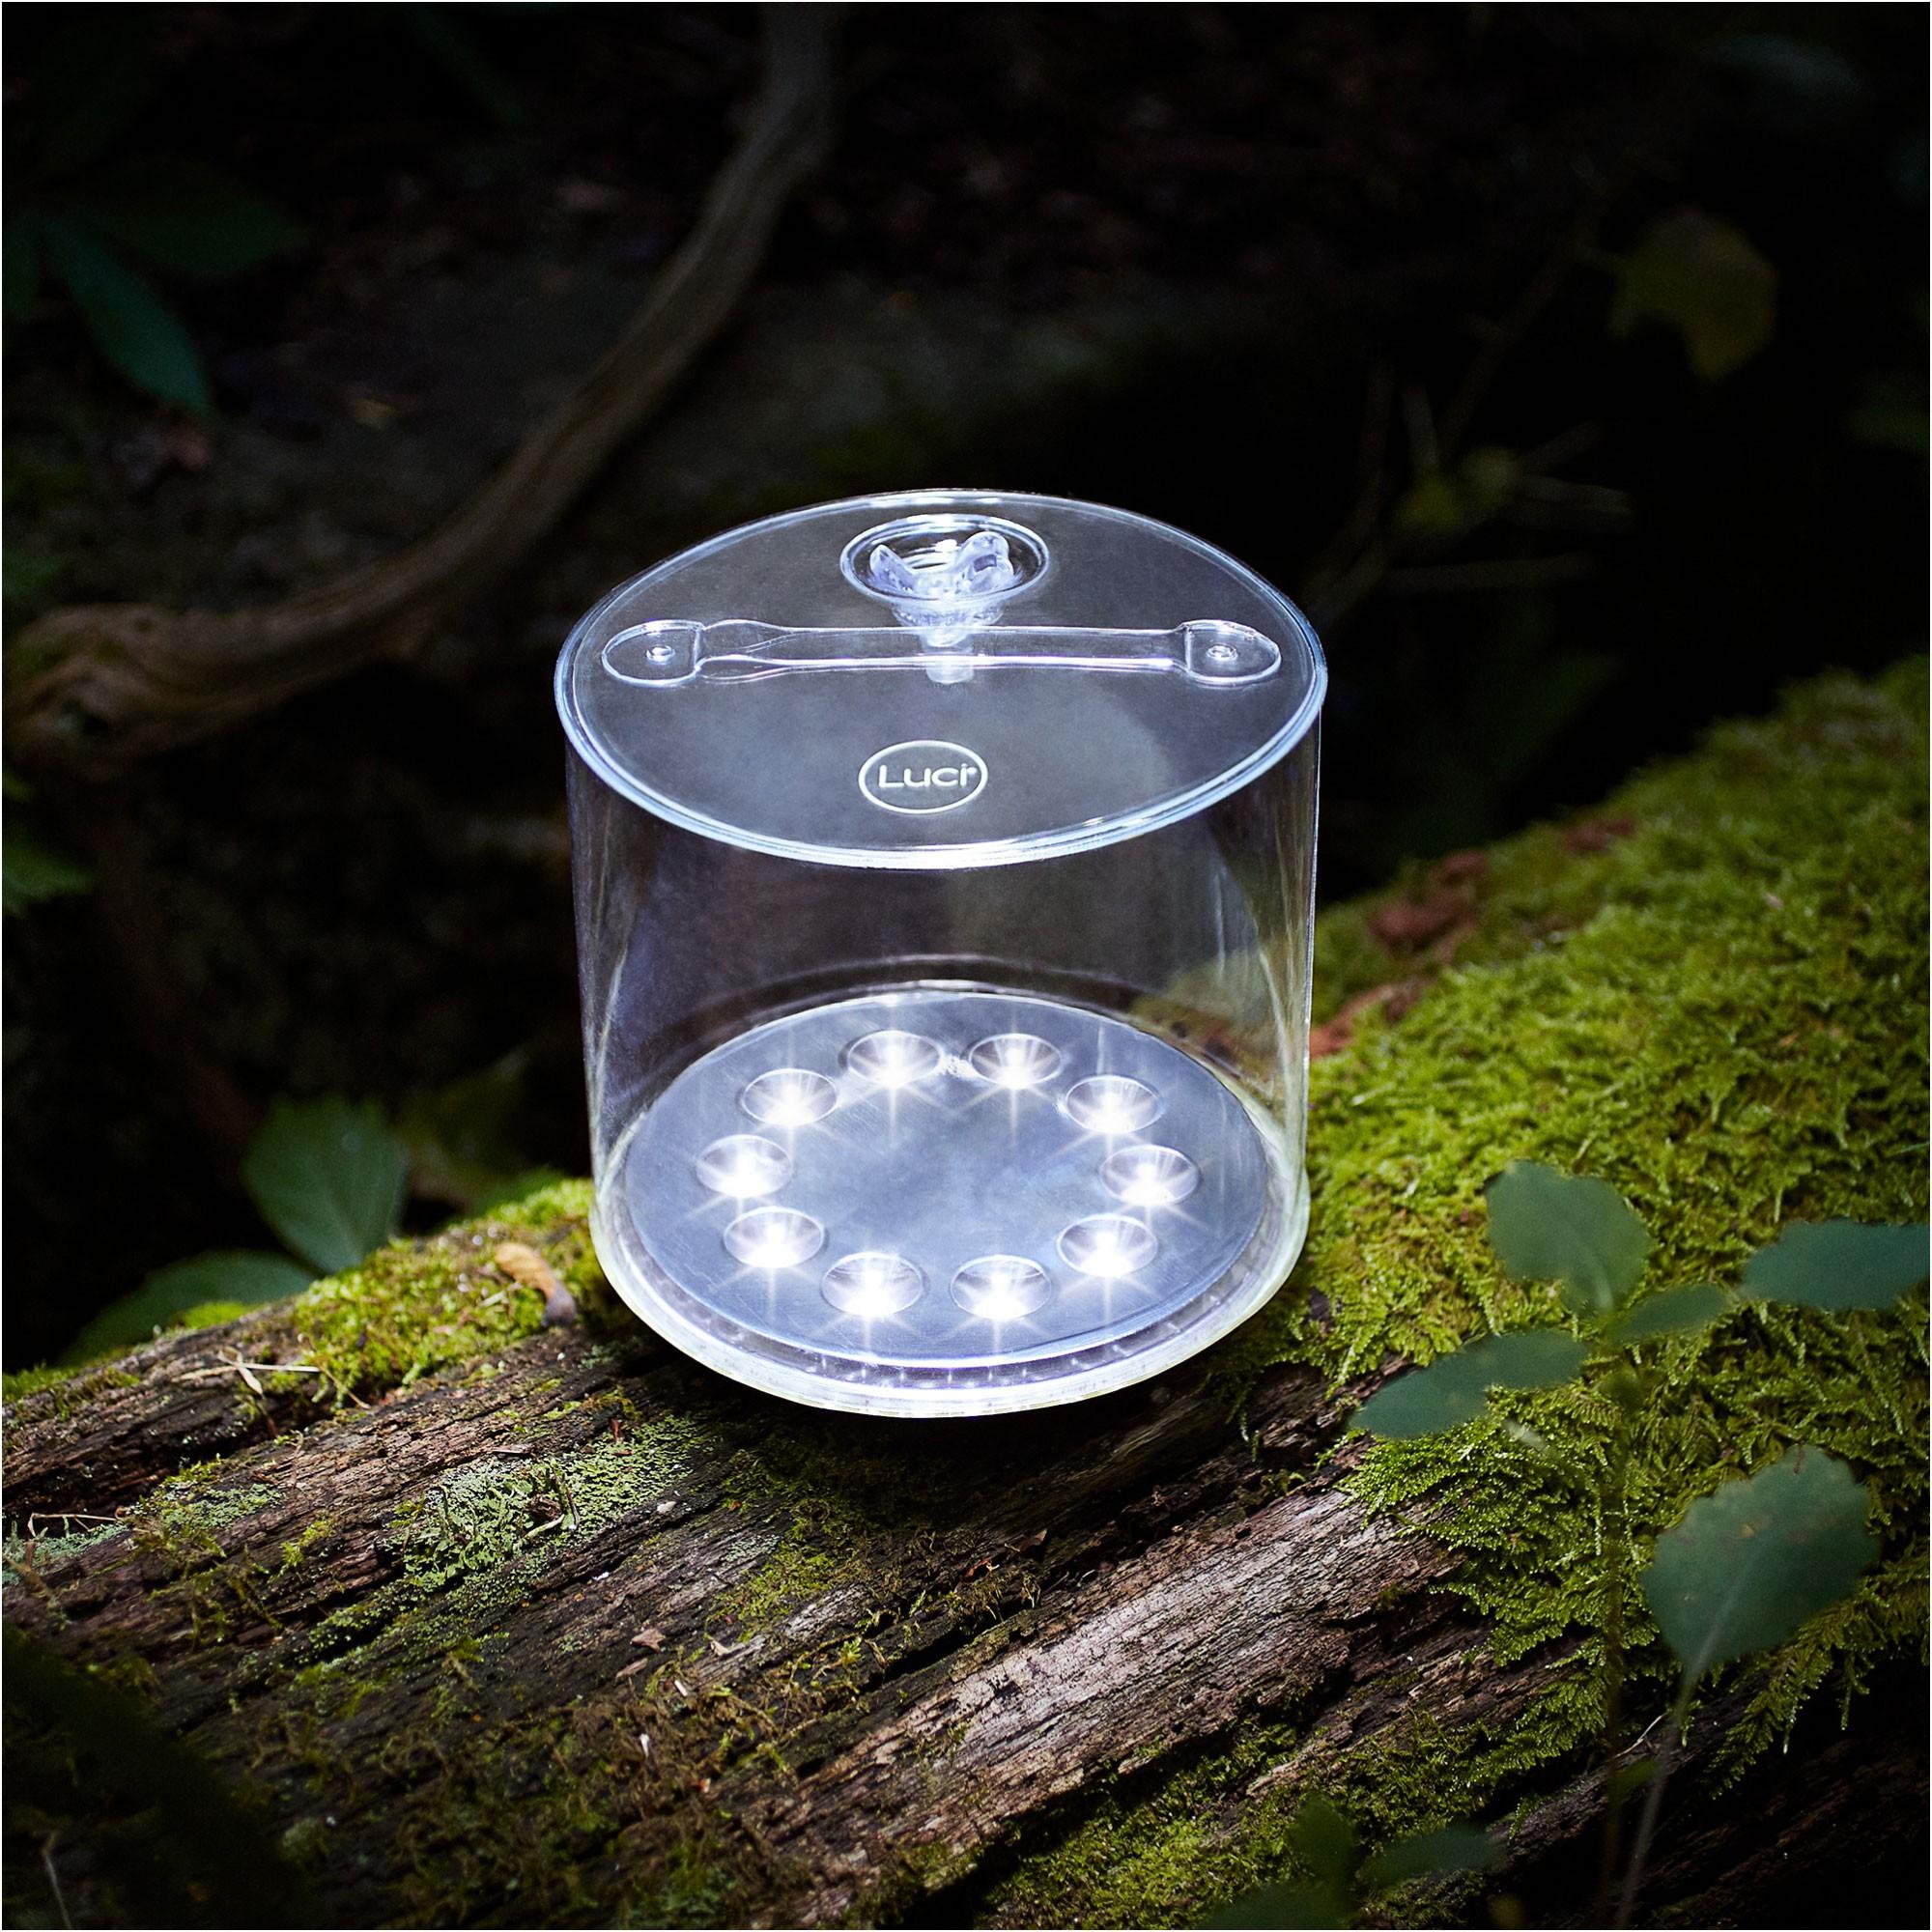 Luci Outdoor 2.0 Solar Lantern